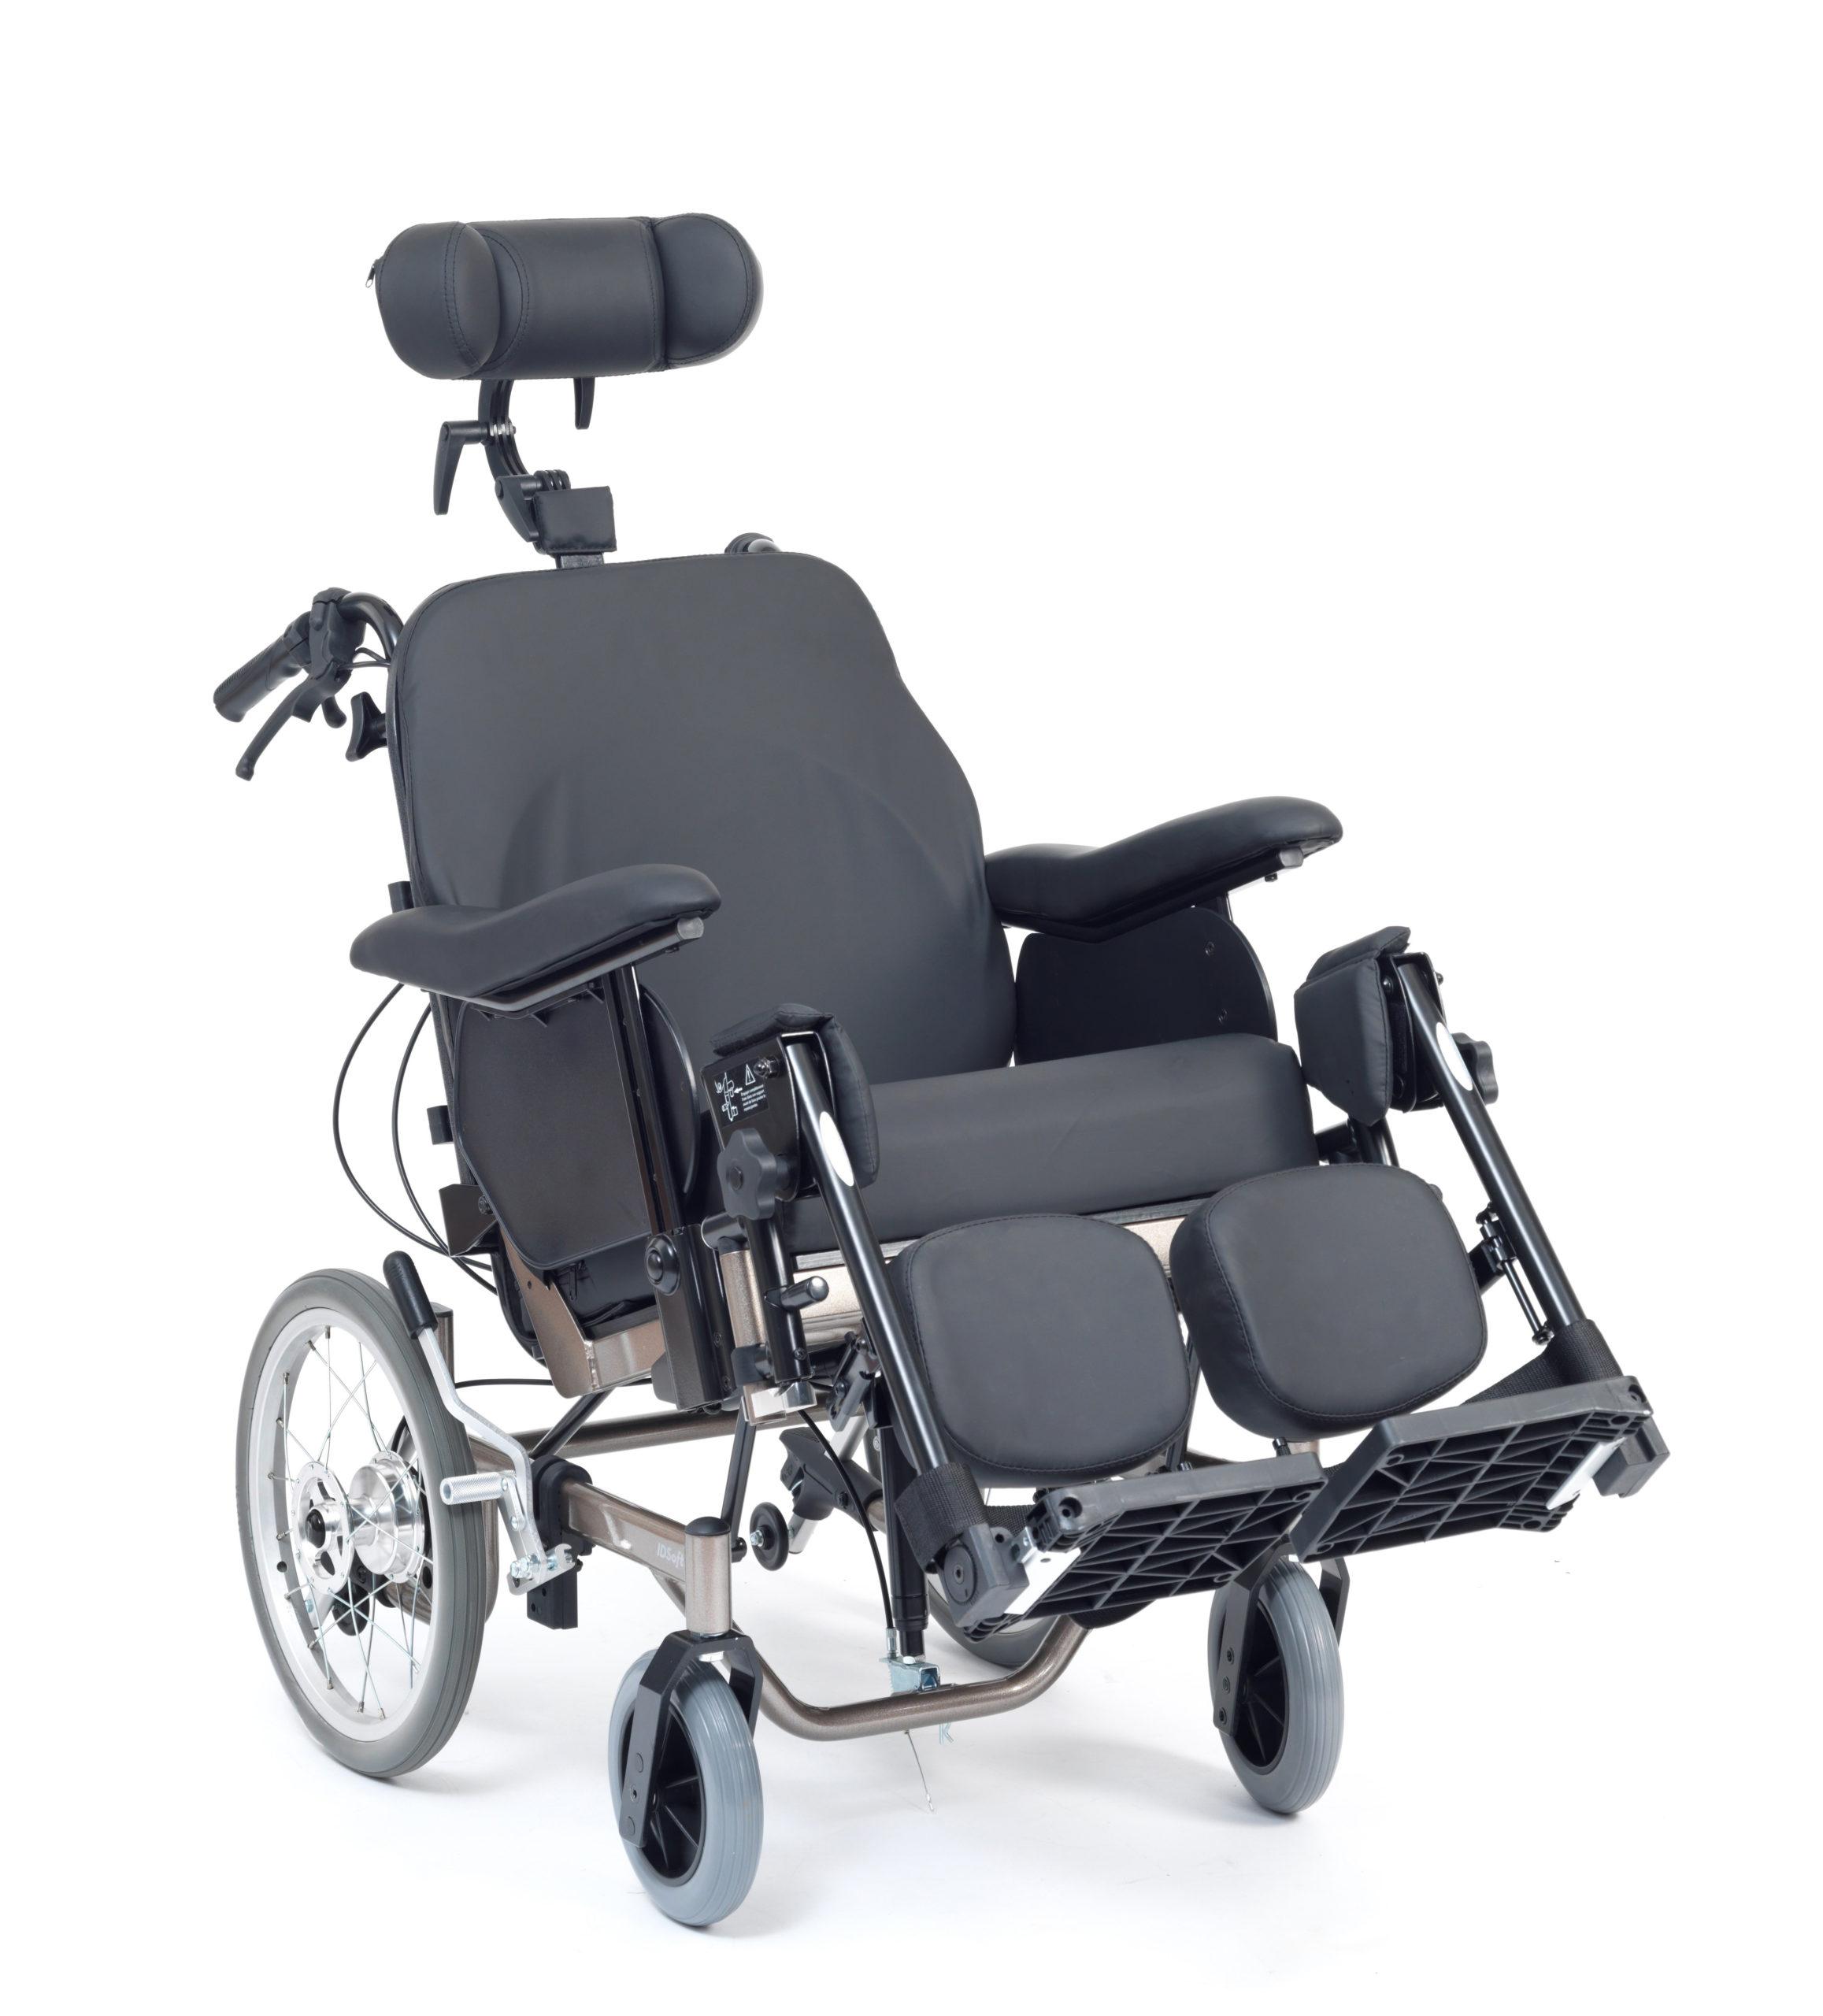 "Transport chair/ Reclining Wheelchair - Transit Wheel 16"" | Medical Supermarket"